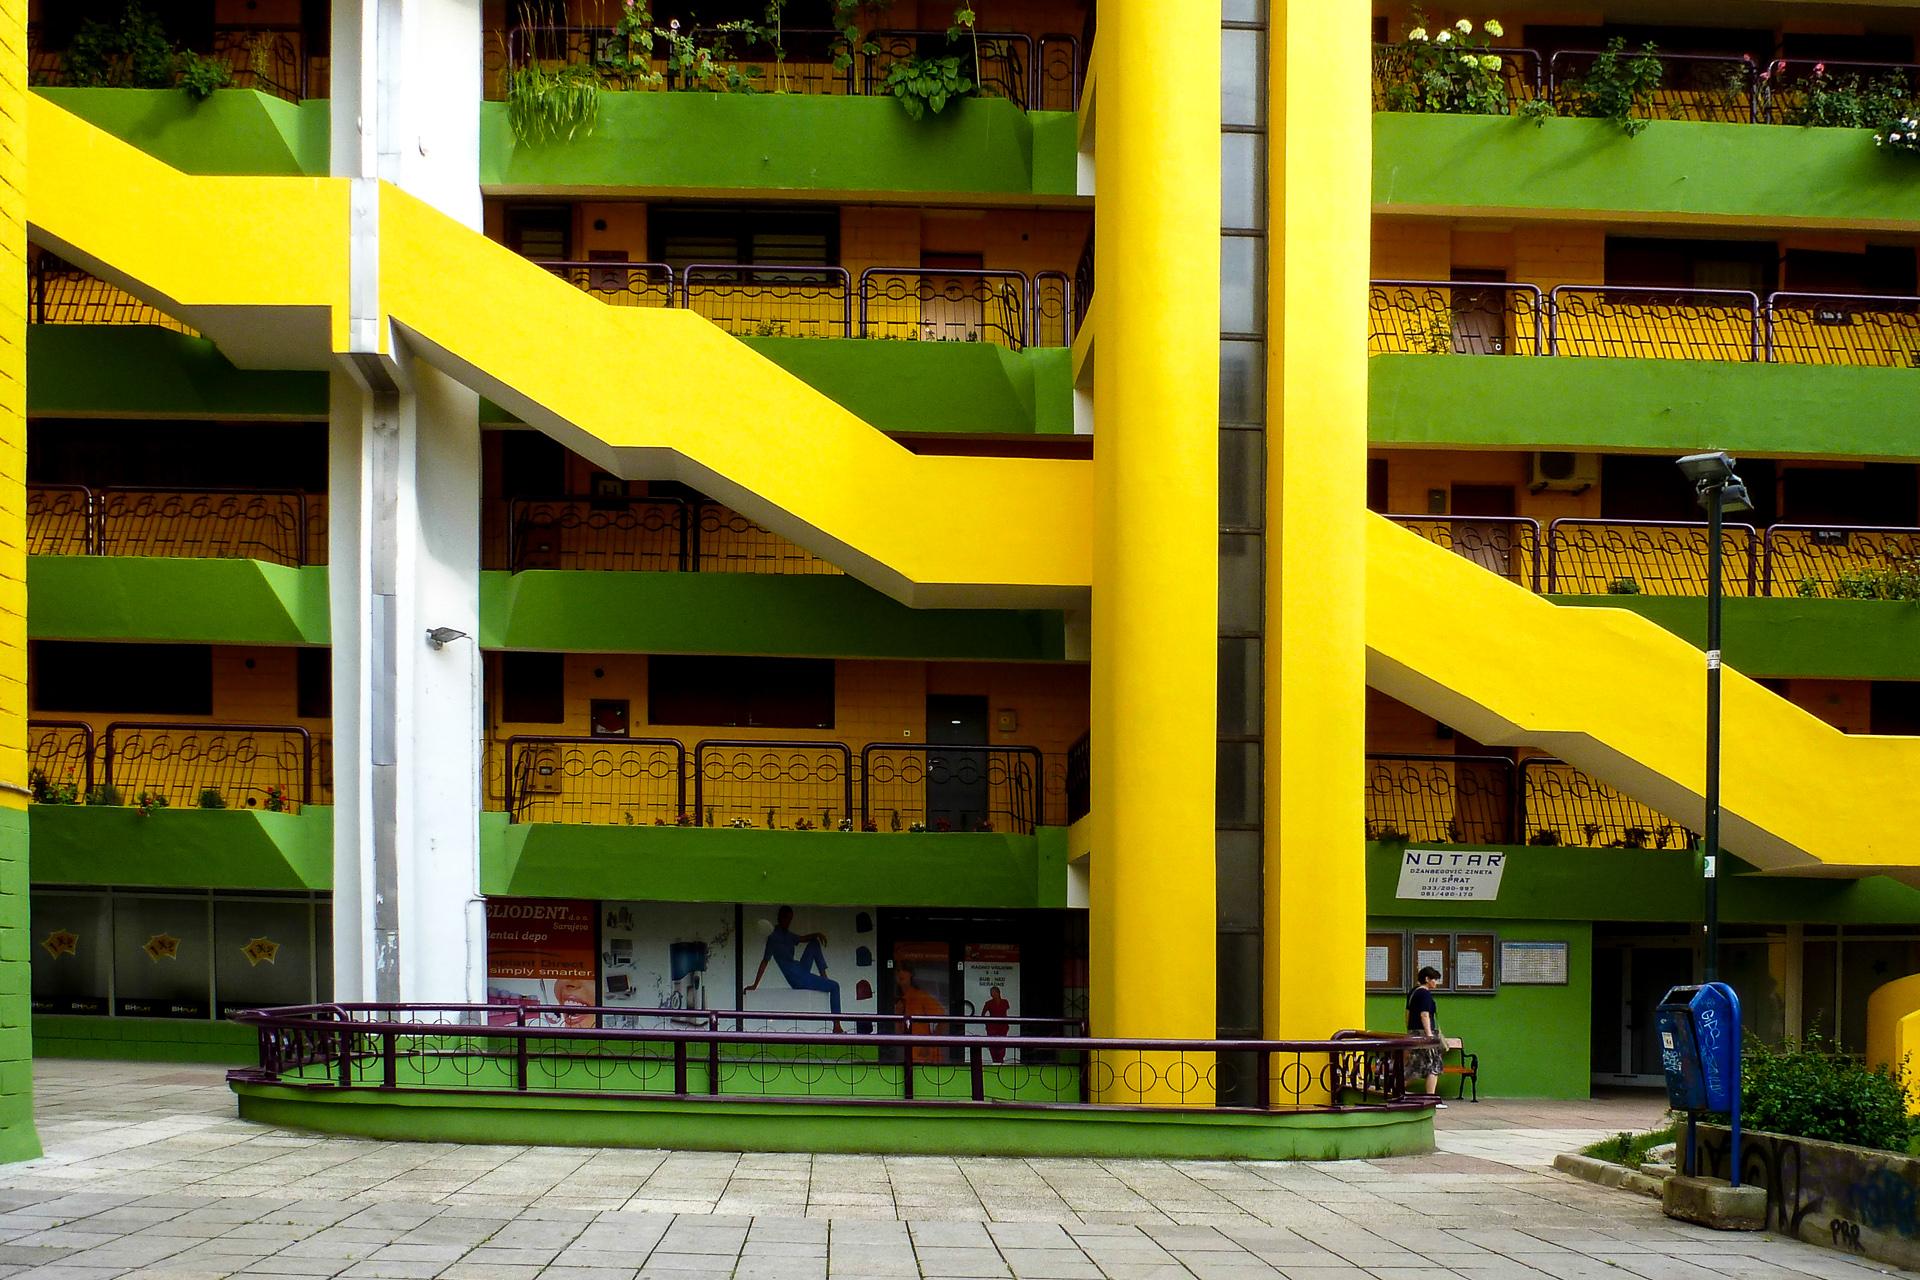 Sarajevo (Foto Béatrice BDM, Flickr)